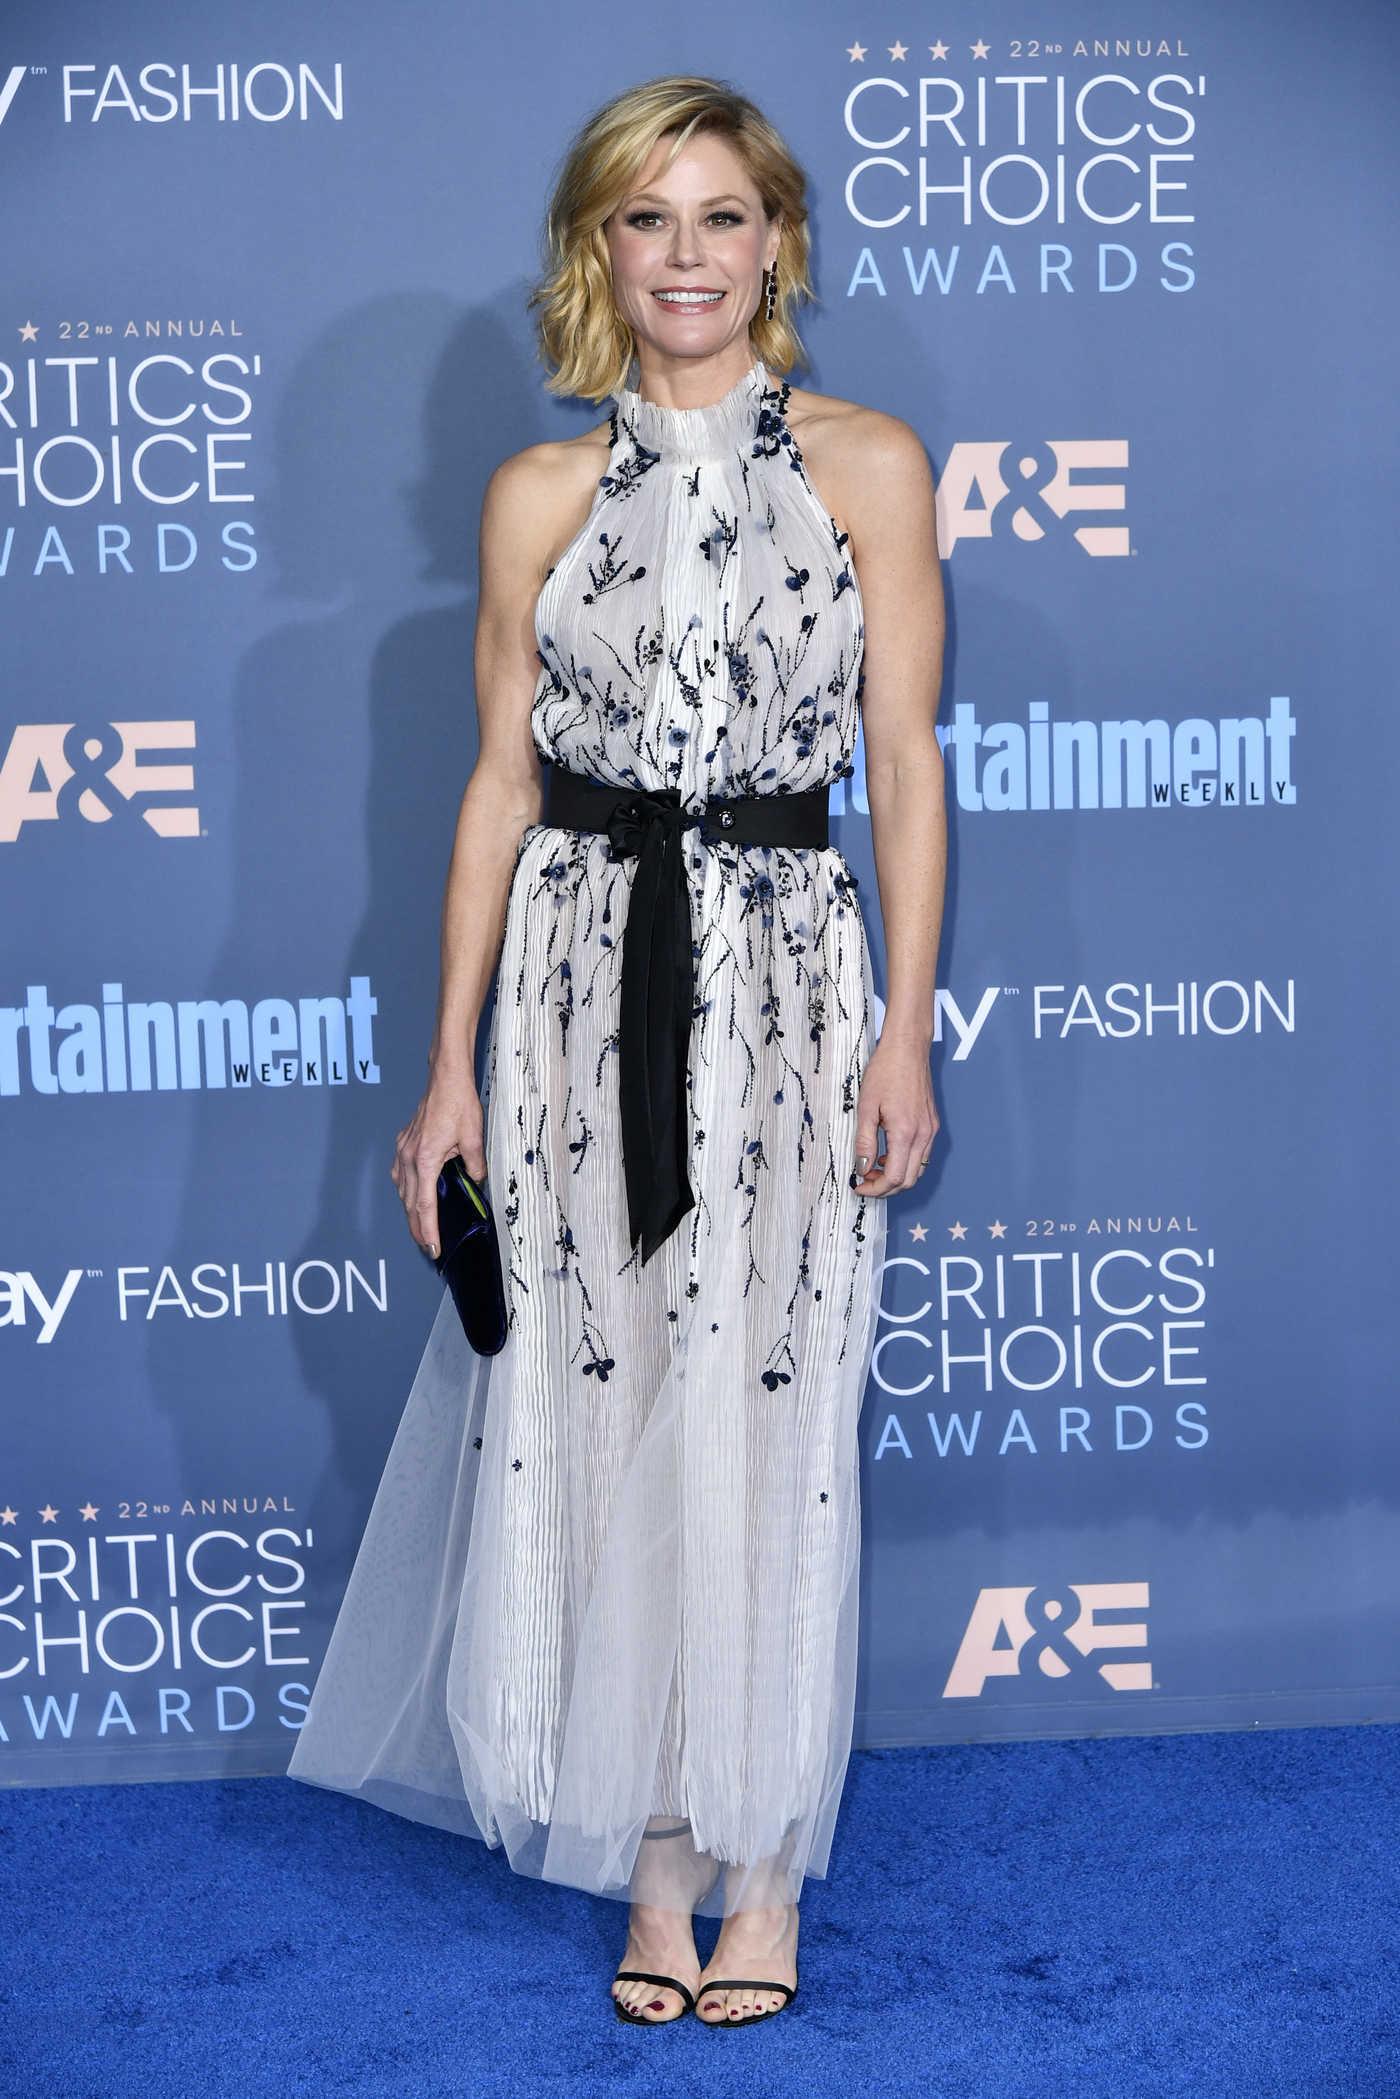 Julie Bowen at the 22nd Annual Critics' Choice Awards in Santa Monica 12/11/2016